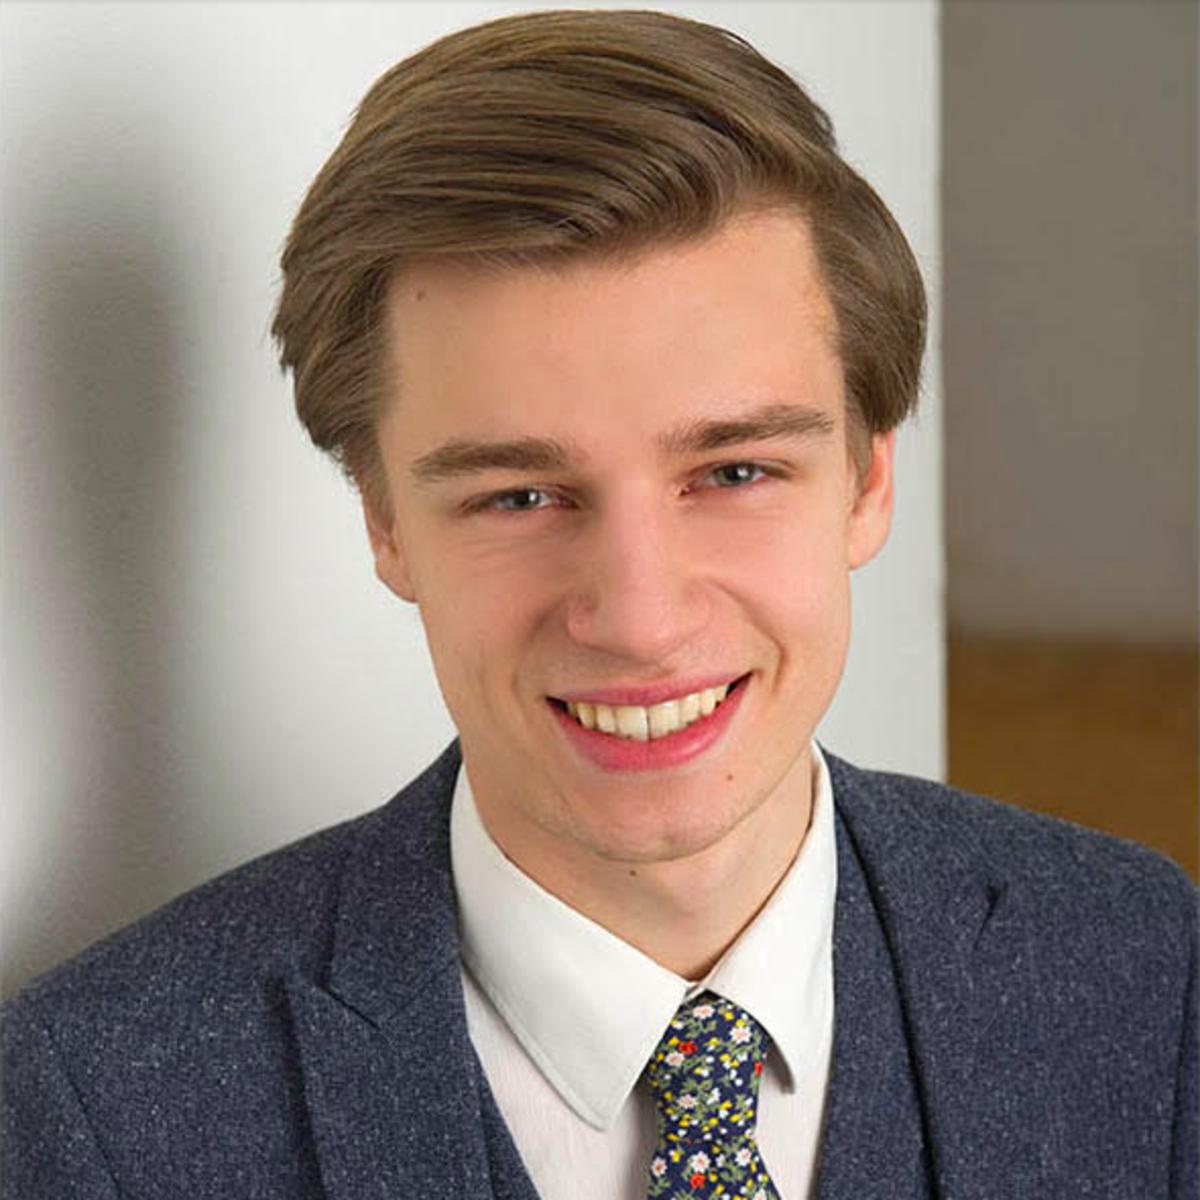 Constantin Helmrich dient in Kiew, Ukraine